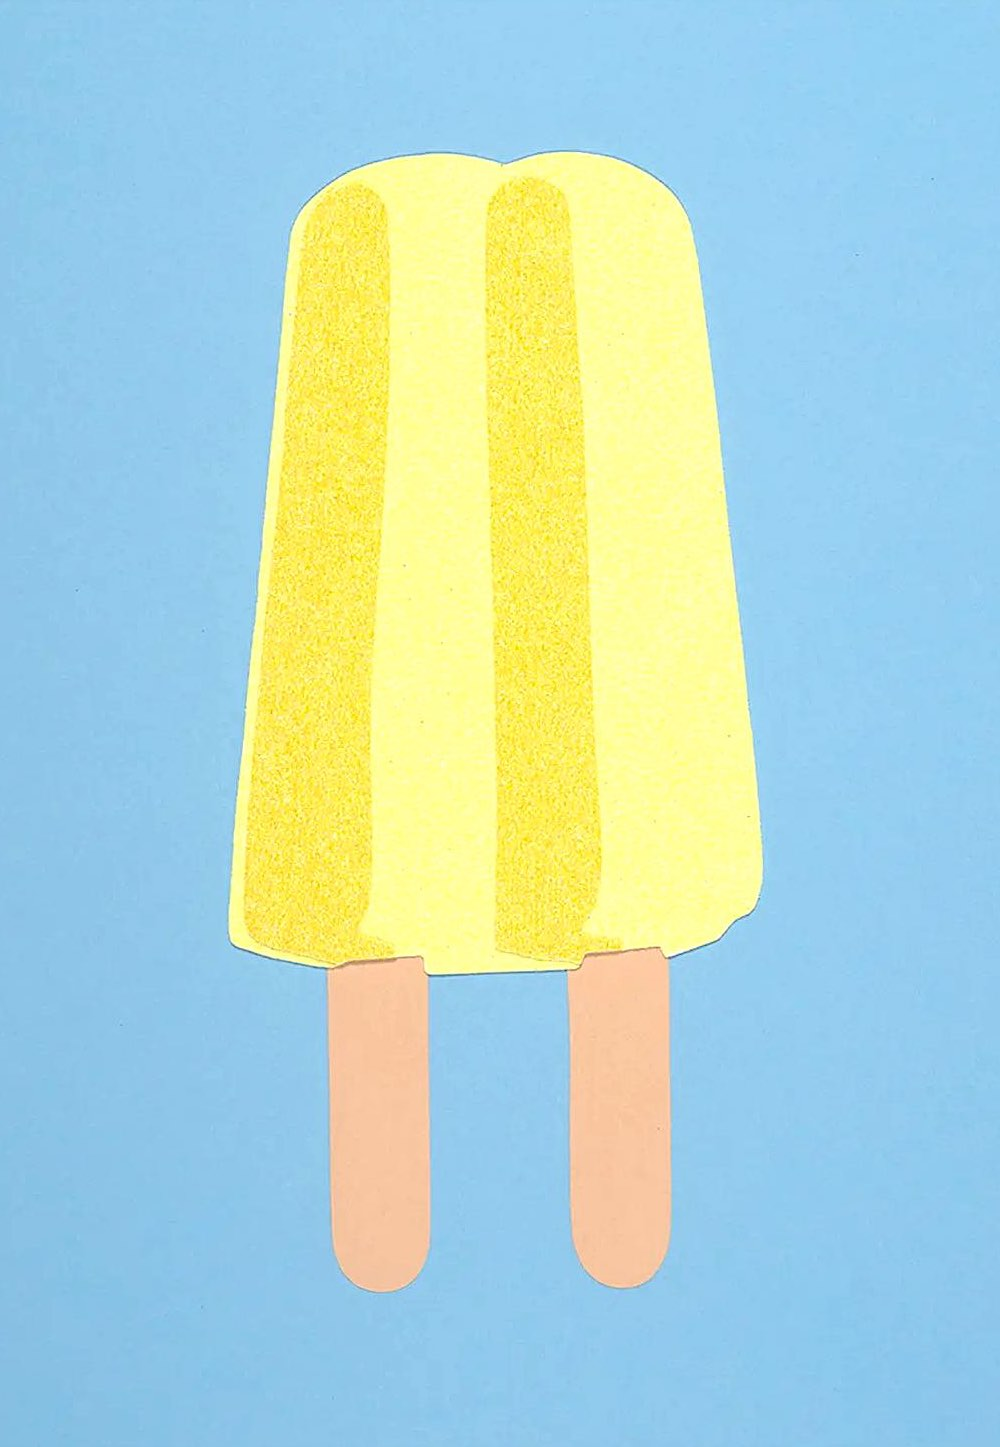 Rankin Willard art, a yellow Popsicle on a blue backgroundt